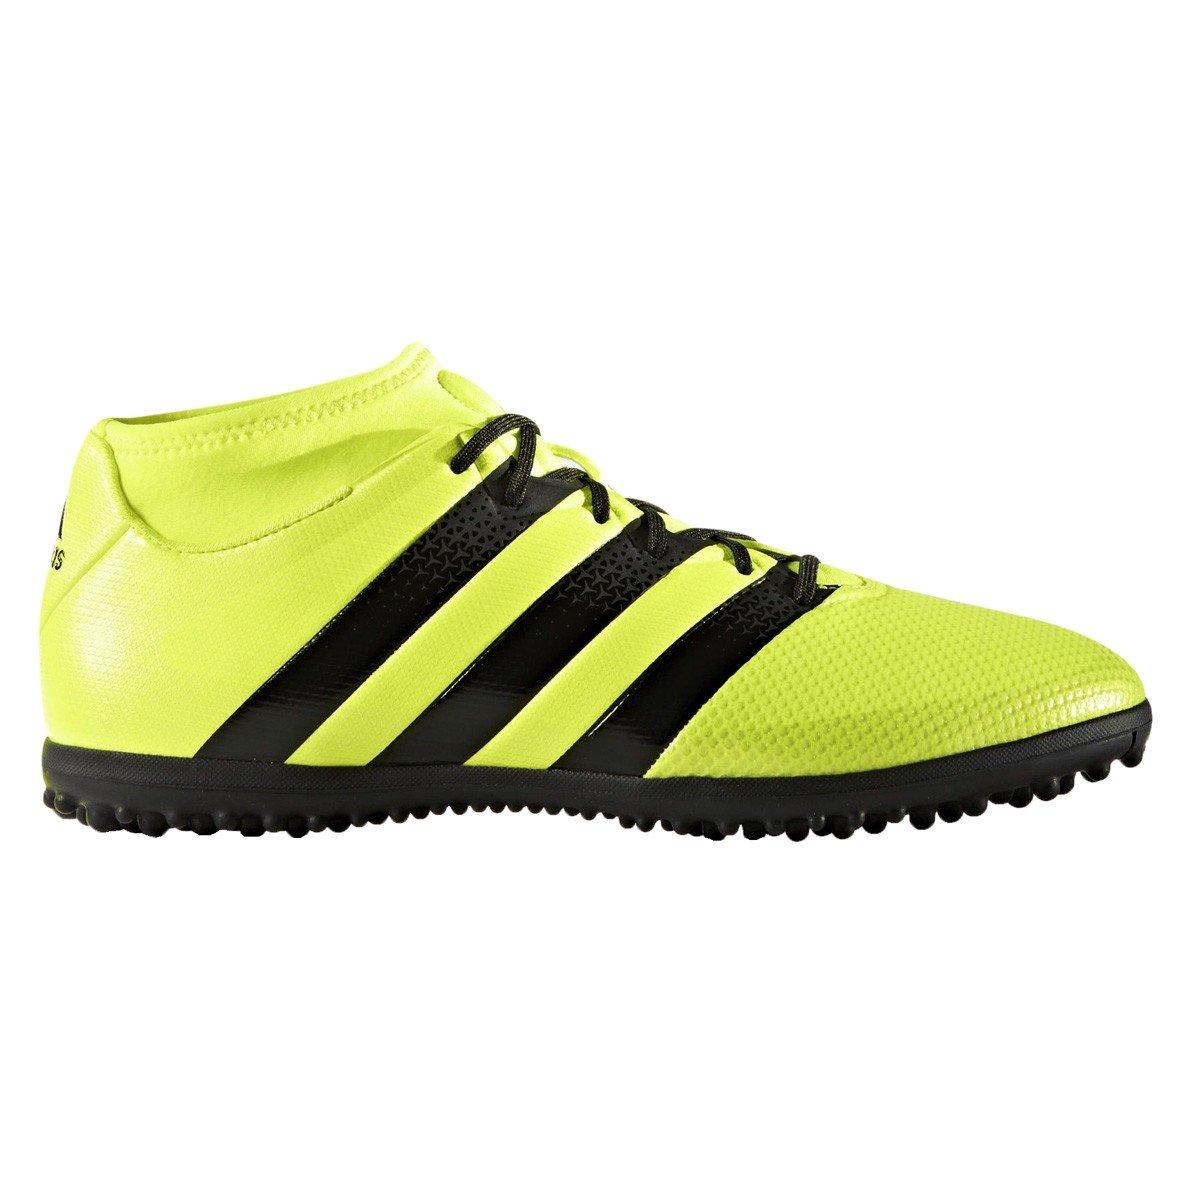 039451bef Chuteira F7 Adidas Ace 16.3 Primemesh AQ3429 - Verde Preto ...